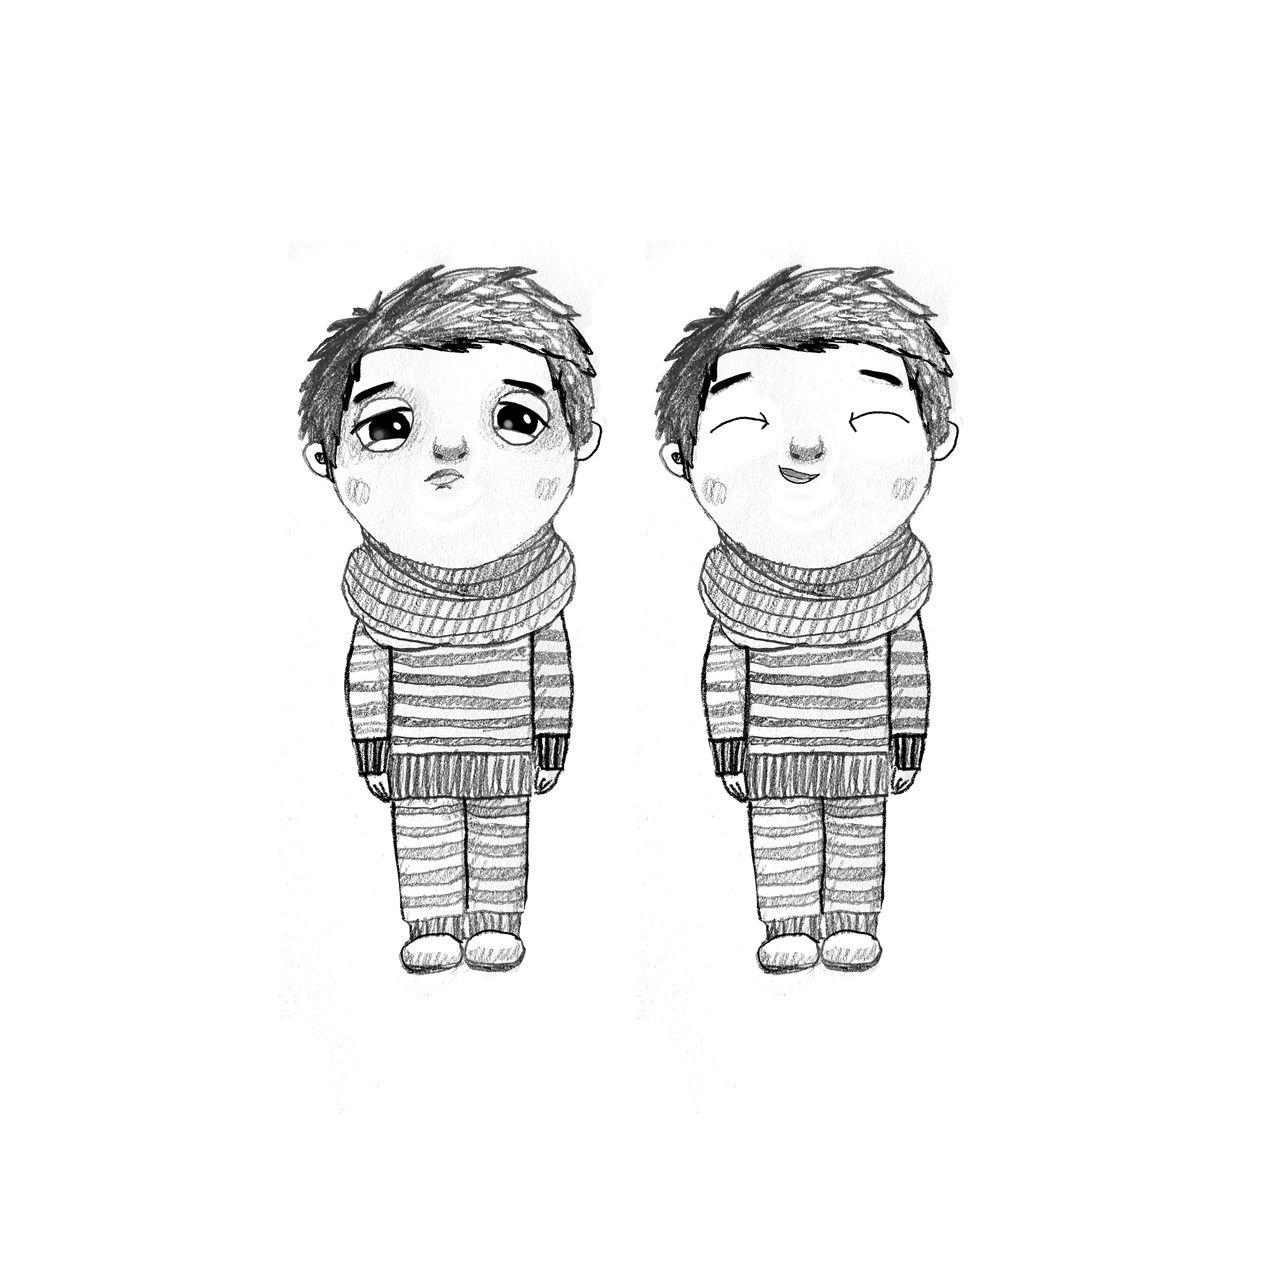 boy_sketch2.jpg